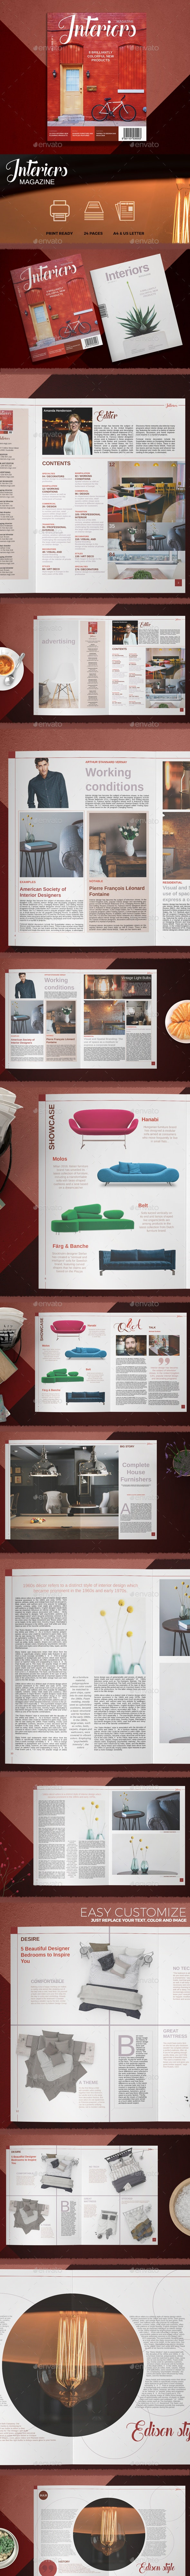 Interiors magazine  - Magazines Print Templates